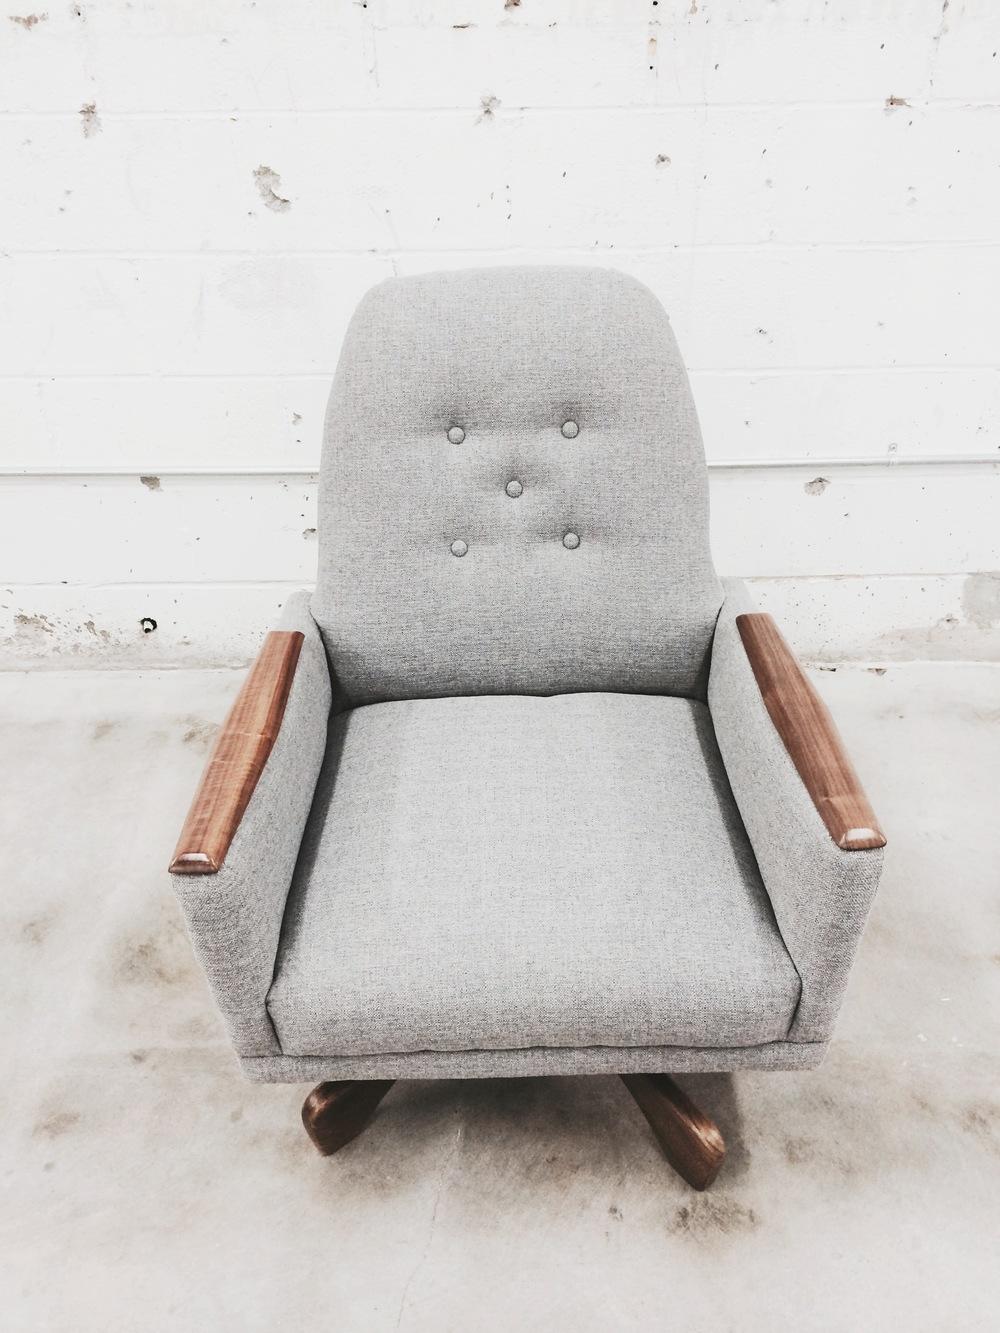 reupholsteredrockingchair.jpg